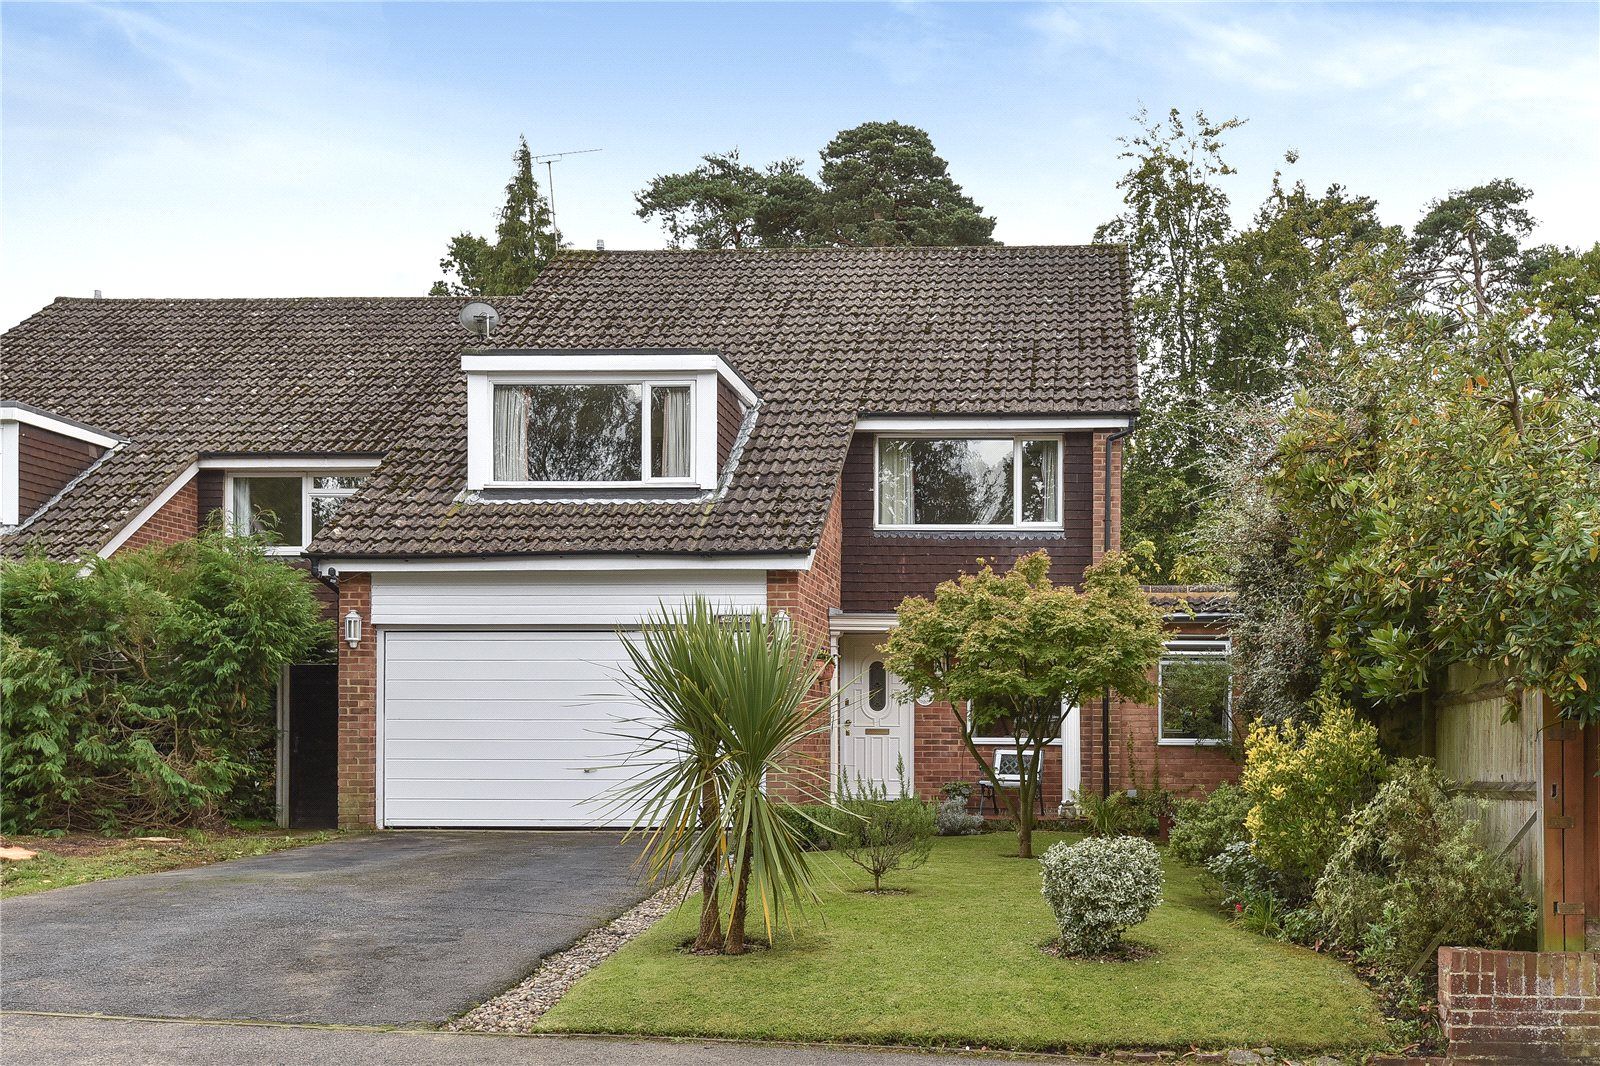 4 Bedrooms Detached House for sale in Llangar Grove, Crowthorne, Berkshire, RG45